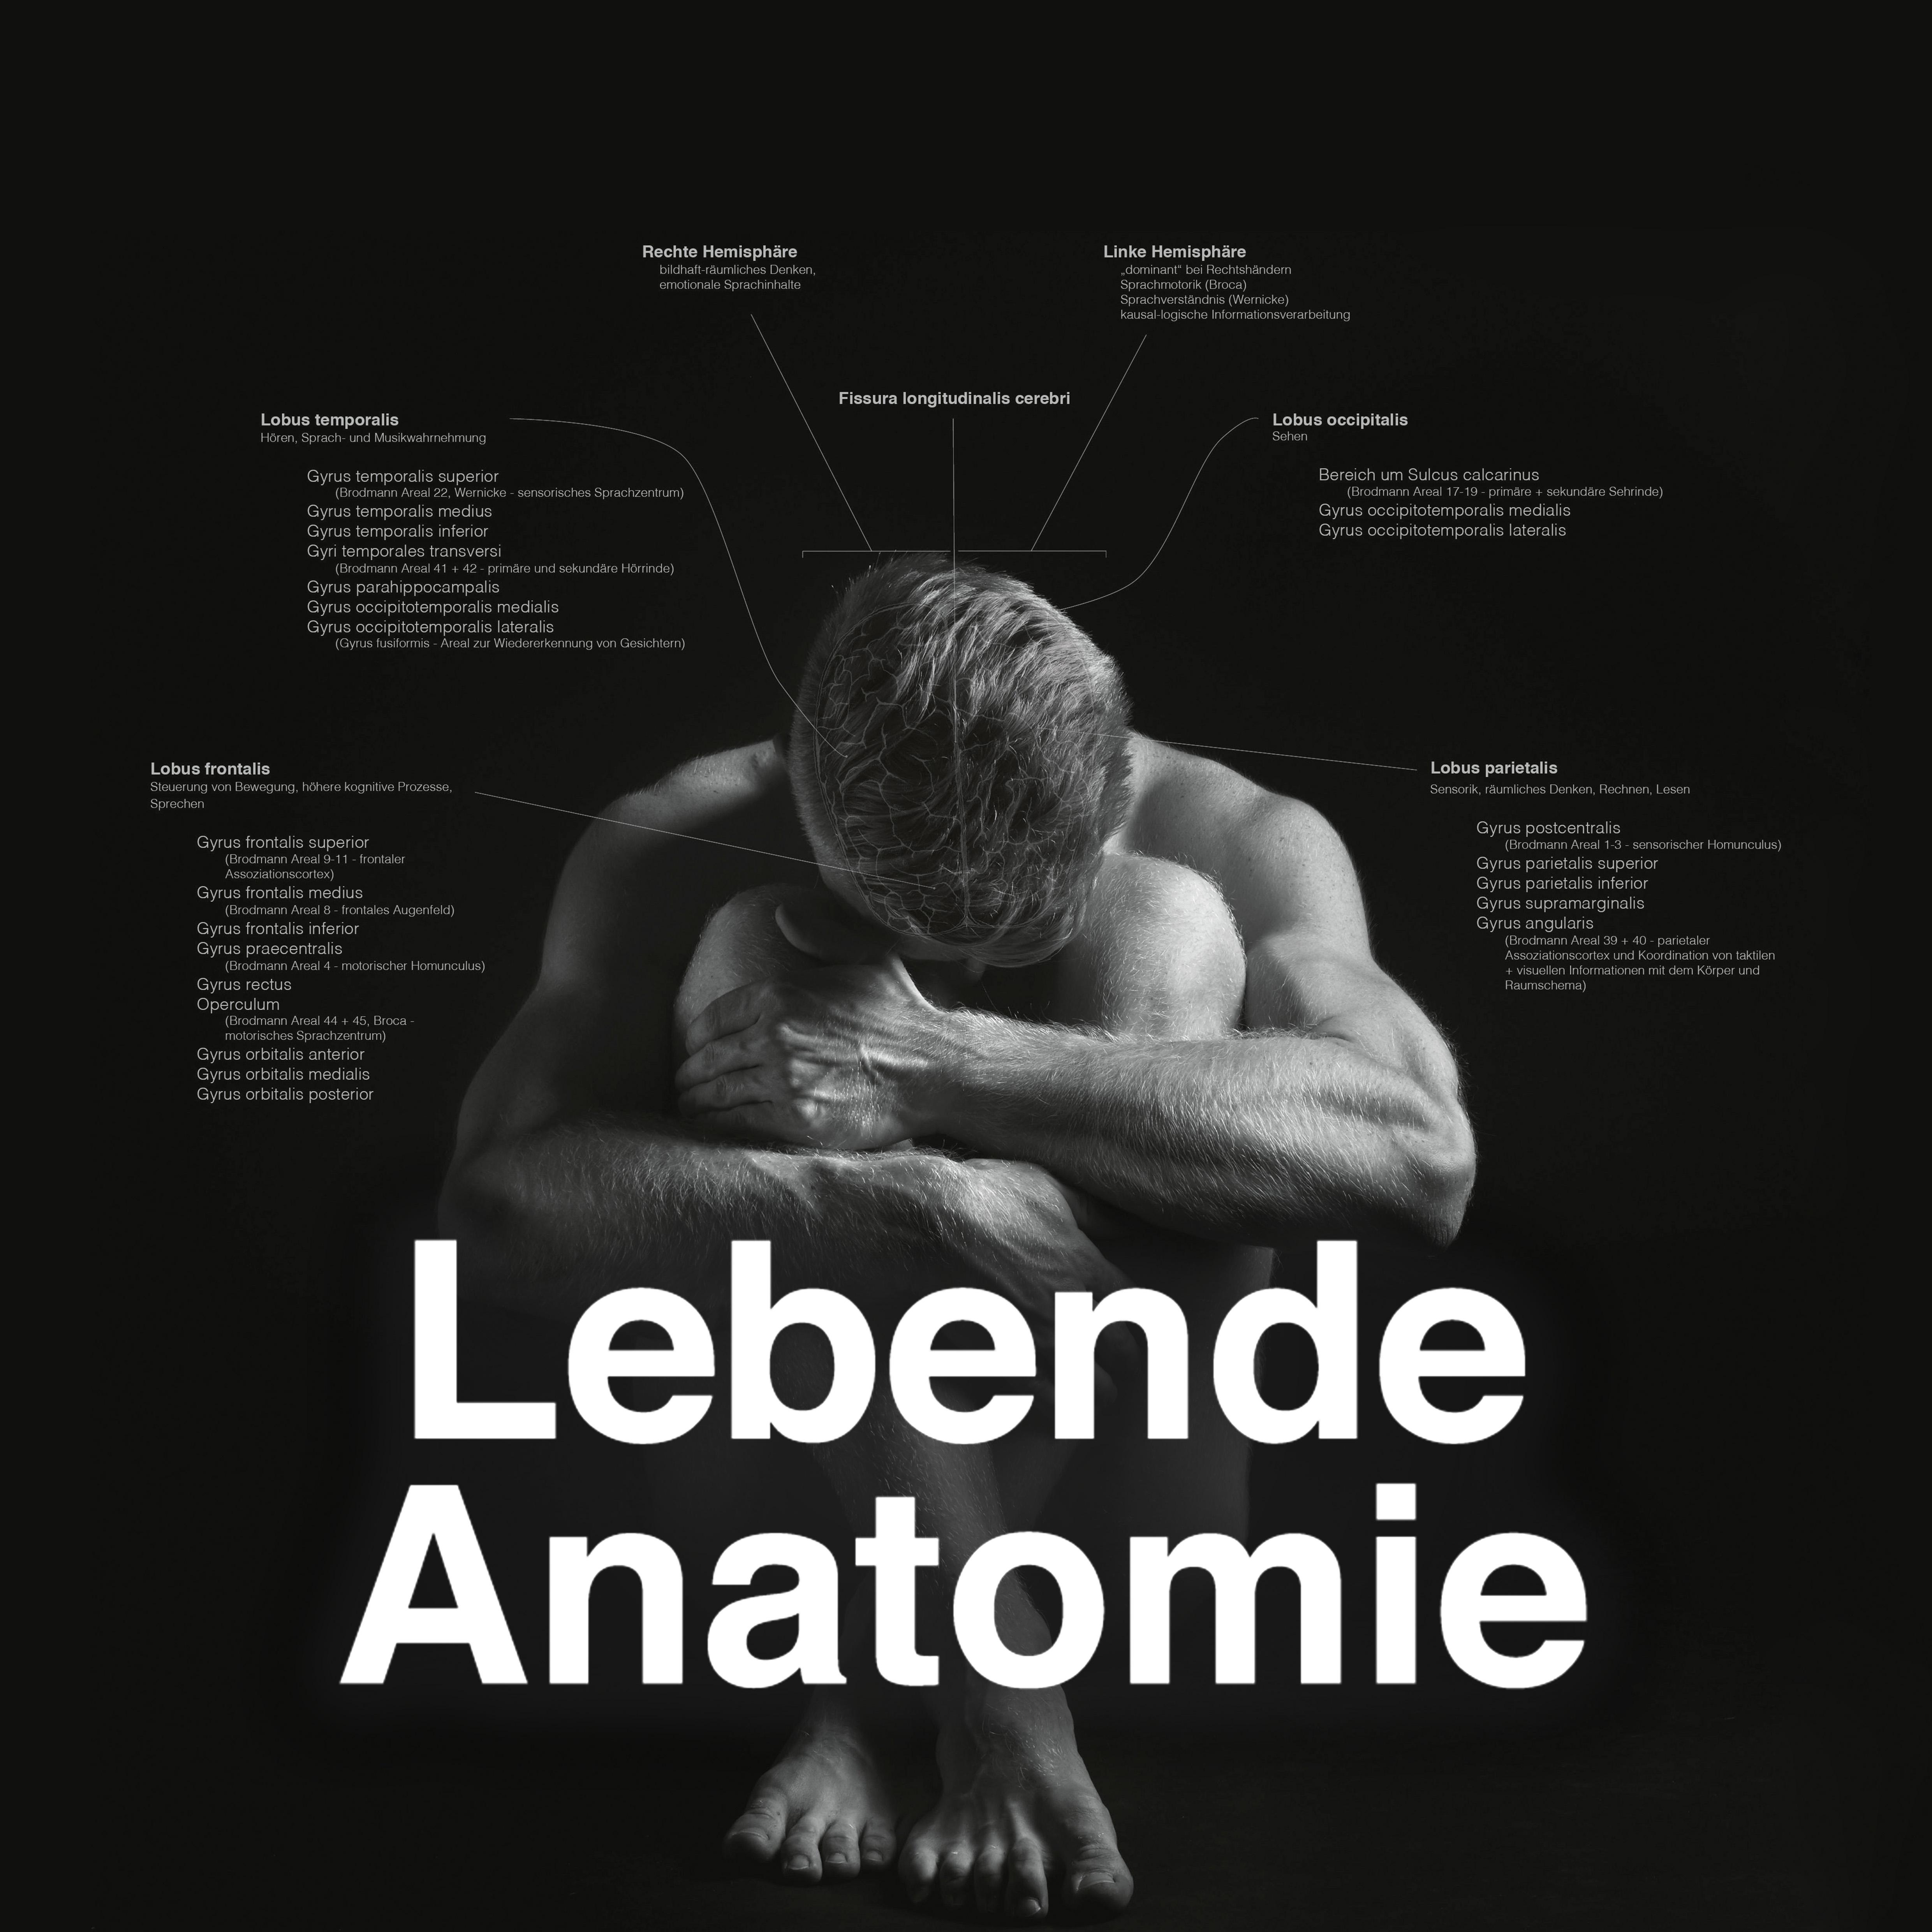 FB Profilbild Lebende Anatomie Kalender 2020 2